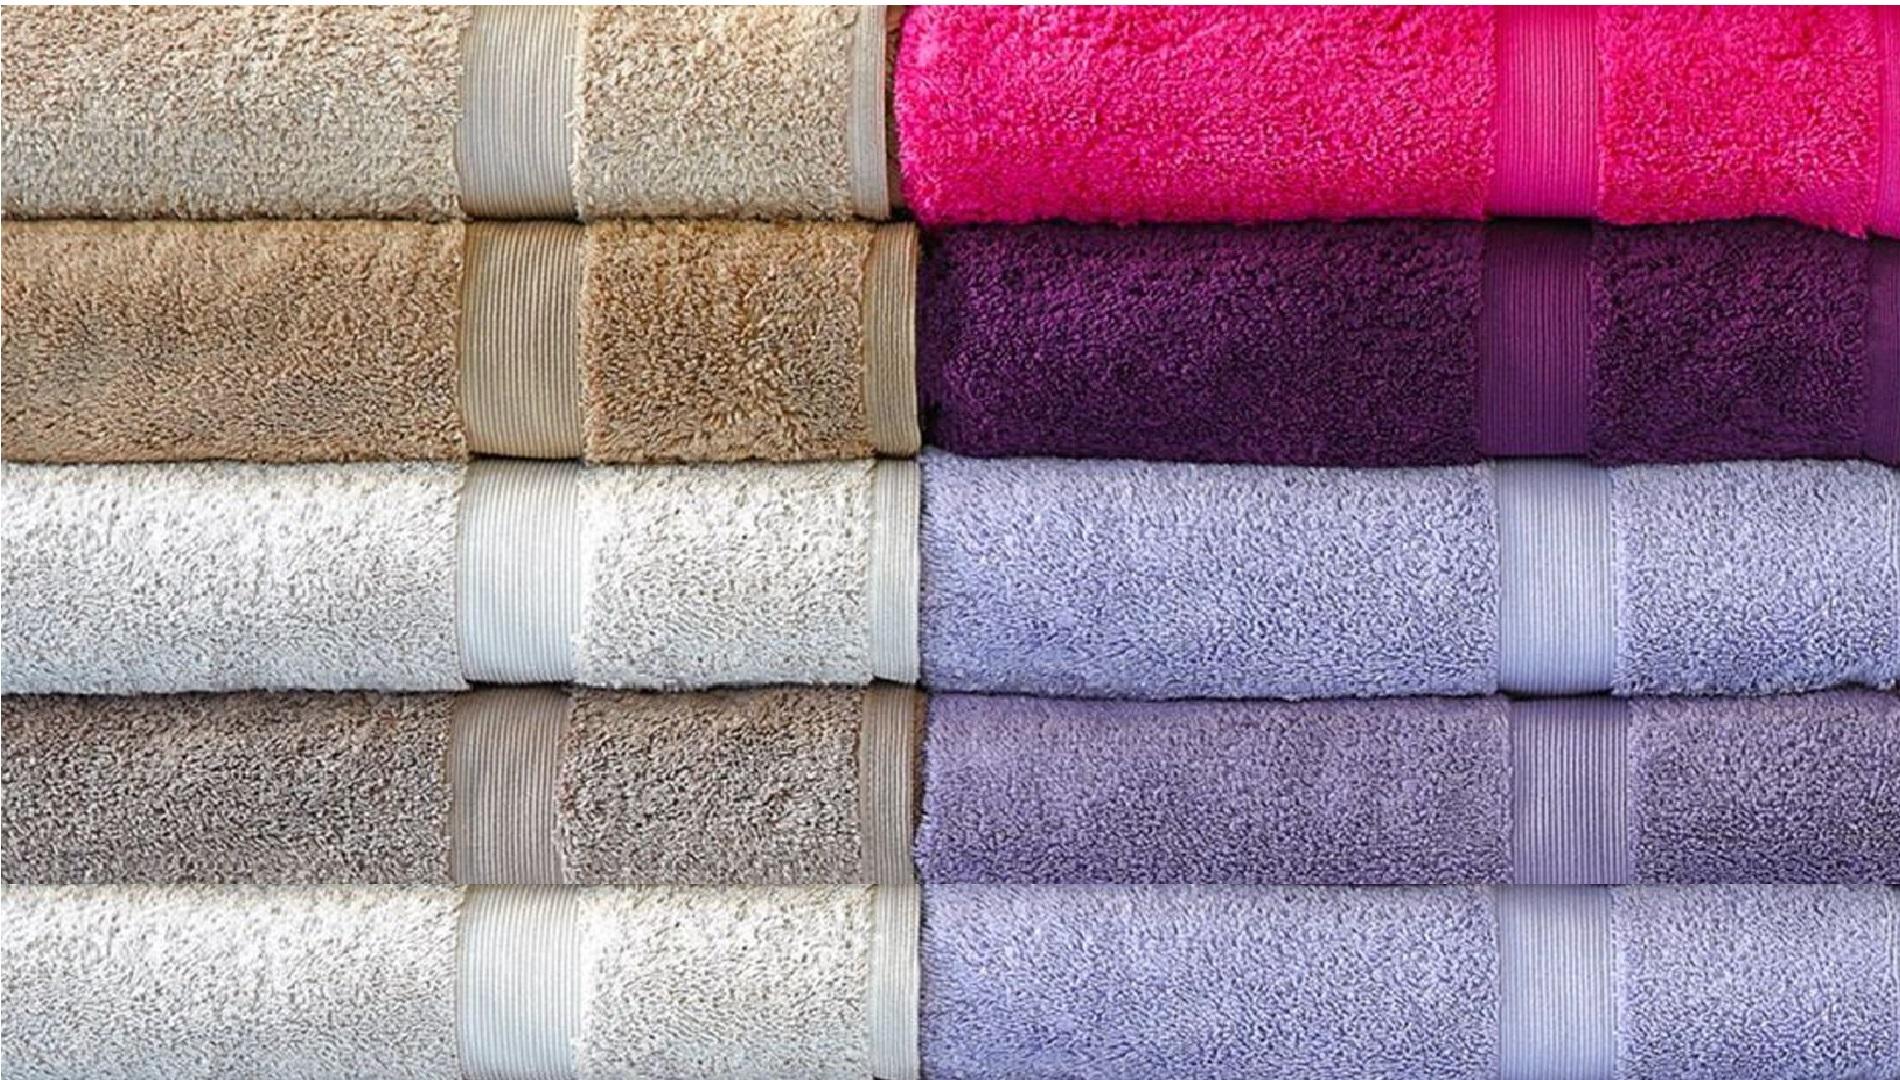 Solapur Textile Market